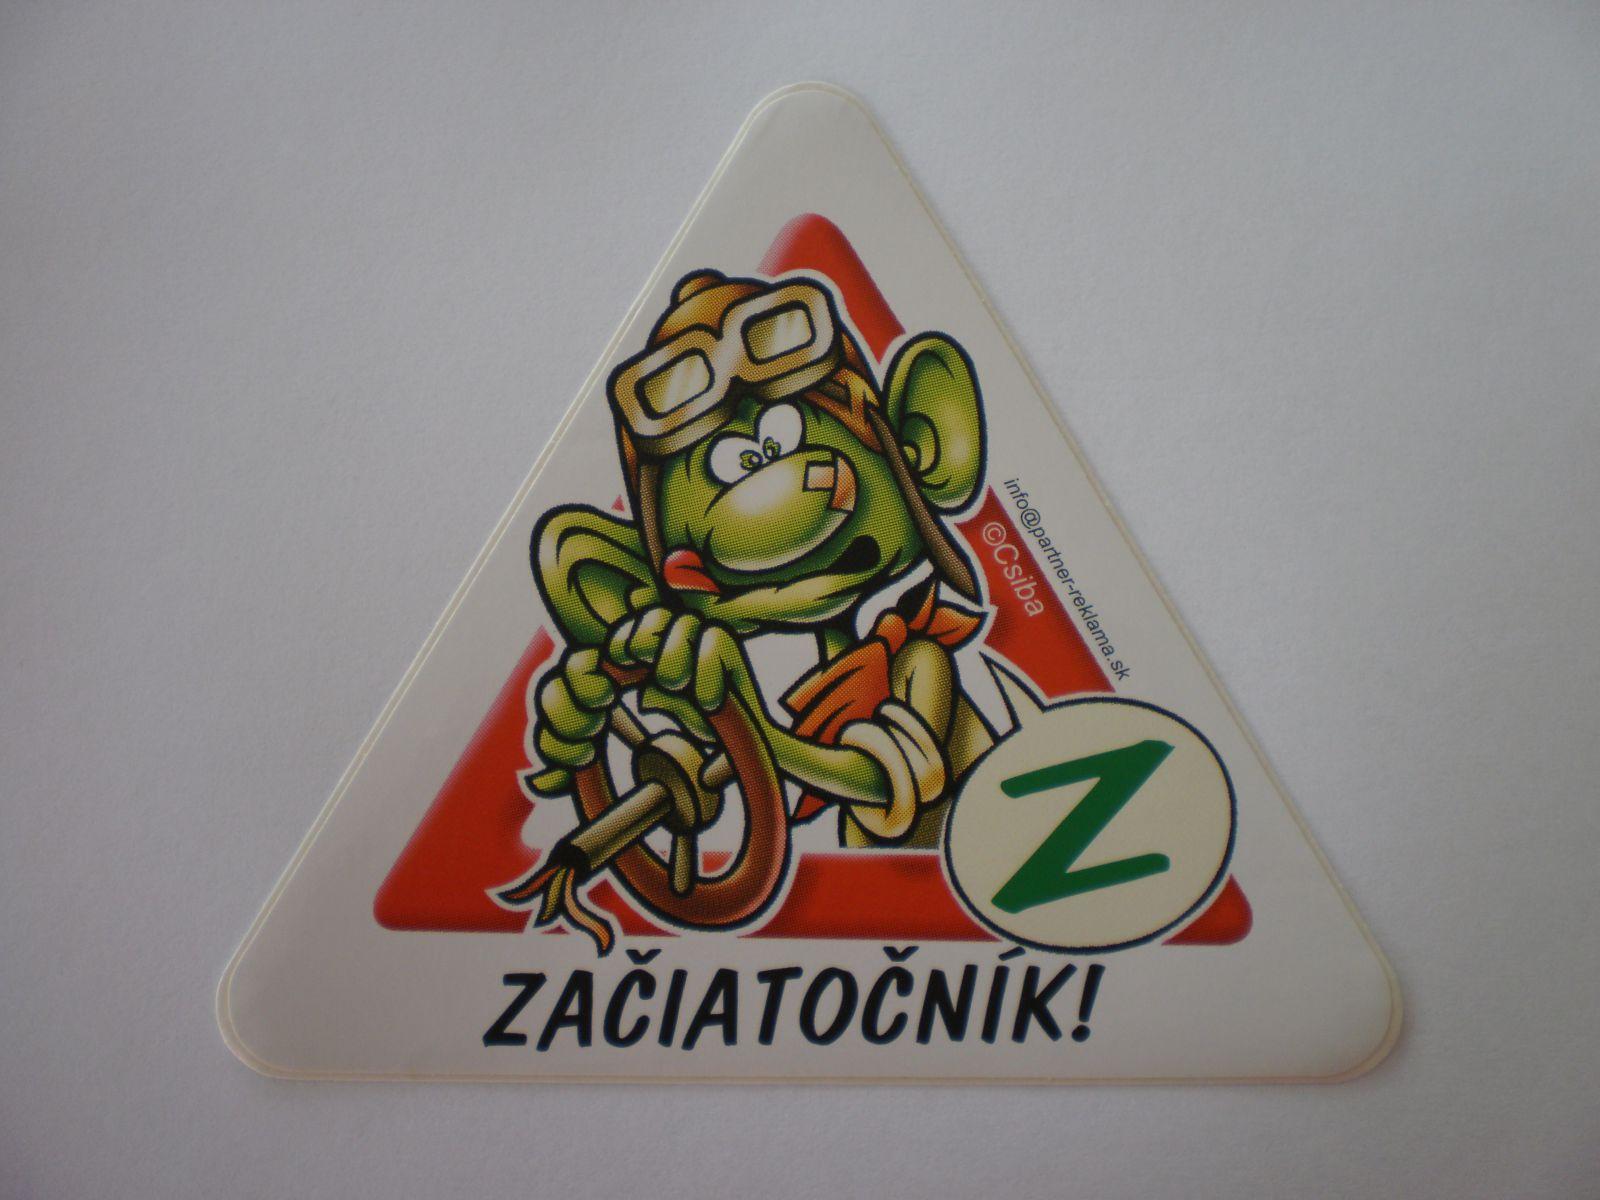 /produkty/199/vankuse-penazenky-ostatne/Ostatni/Zaciatocnik